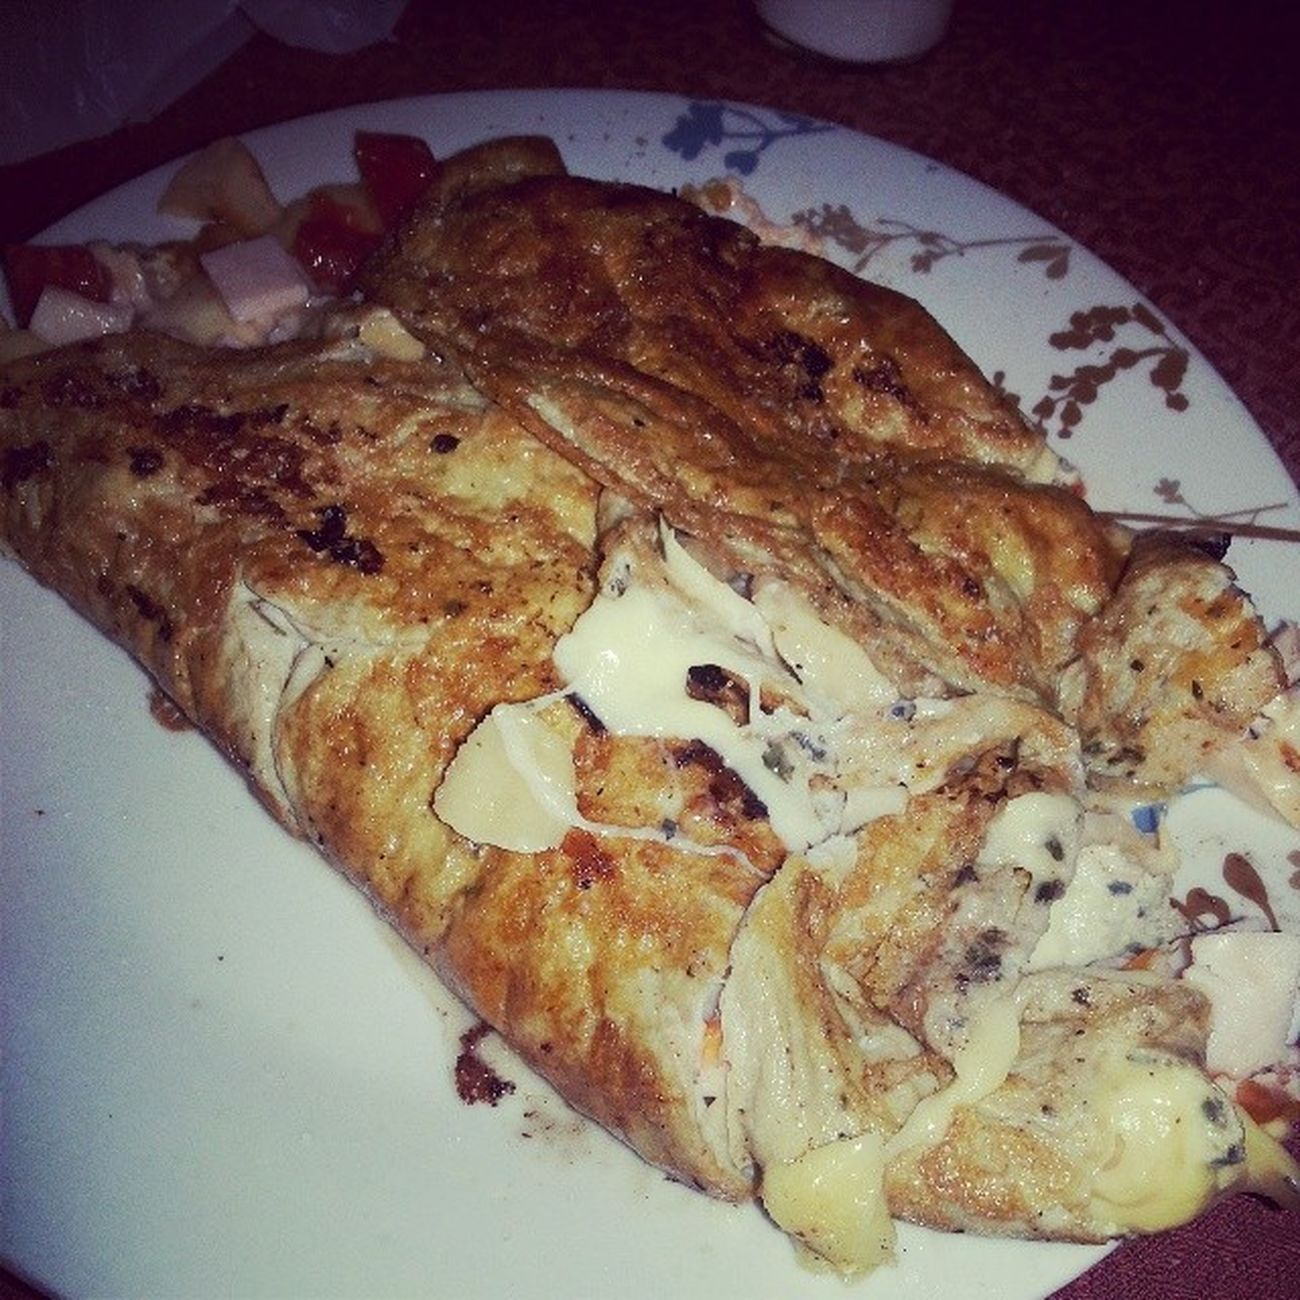 Omelett Cocinado por LaVozDeChile jejejej Se lo comera Mi Hermano Kenny